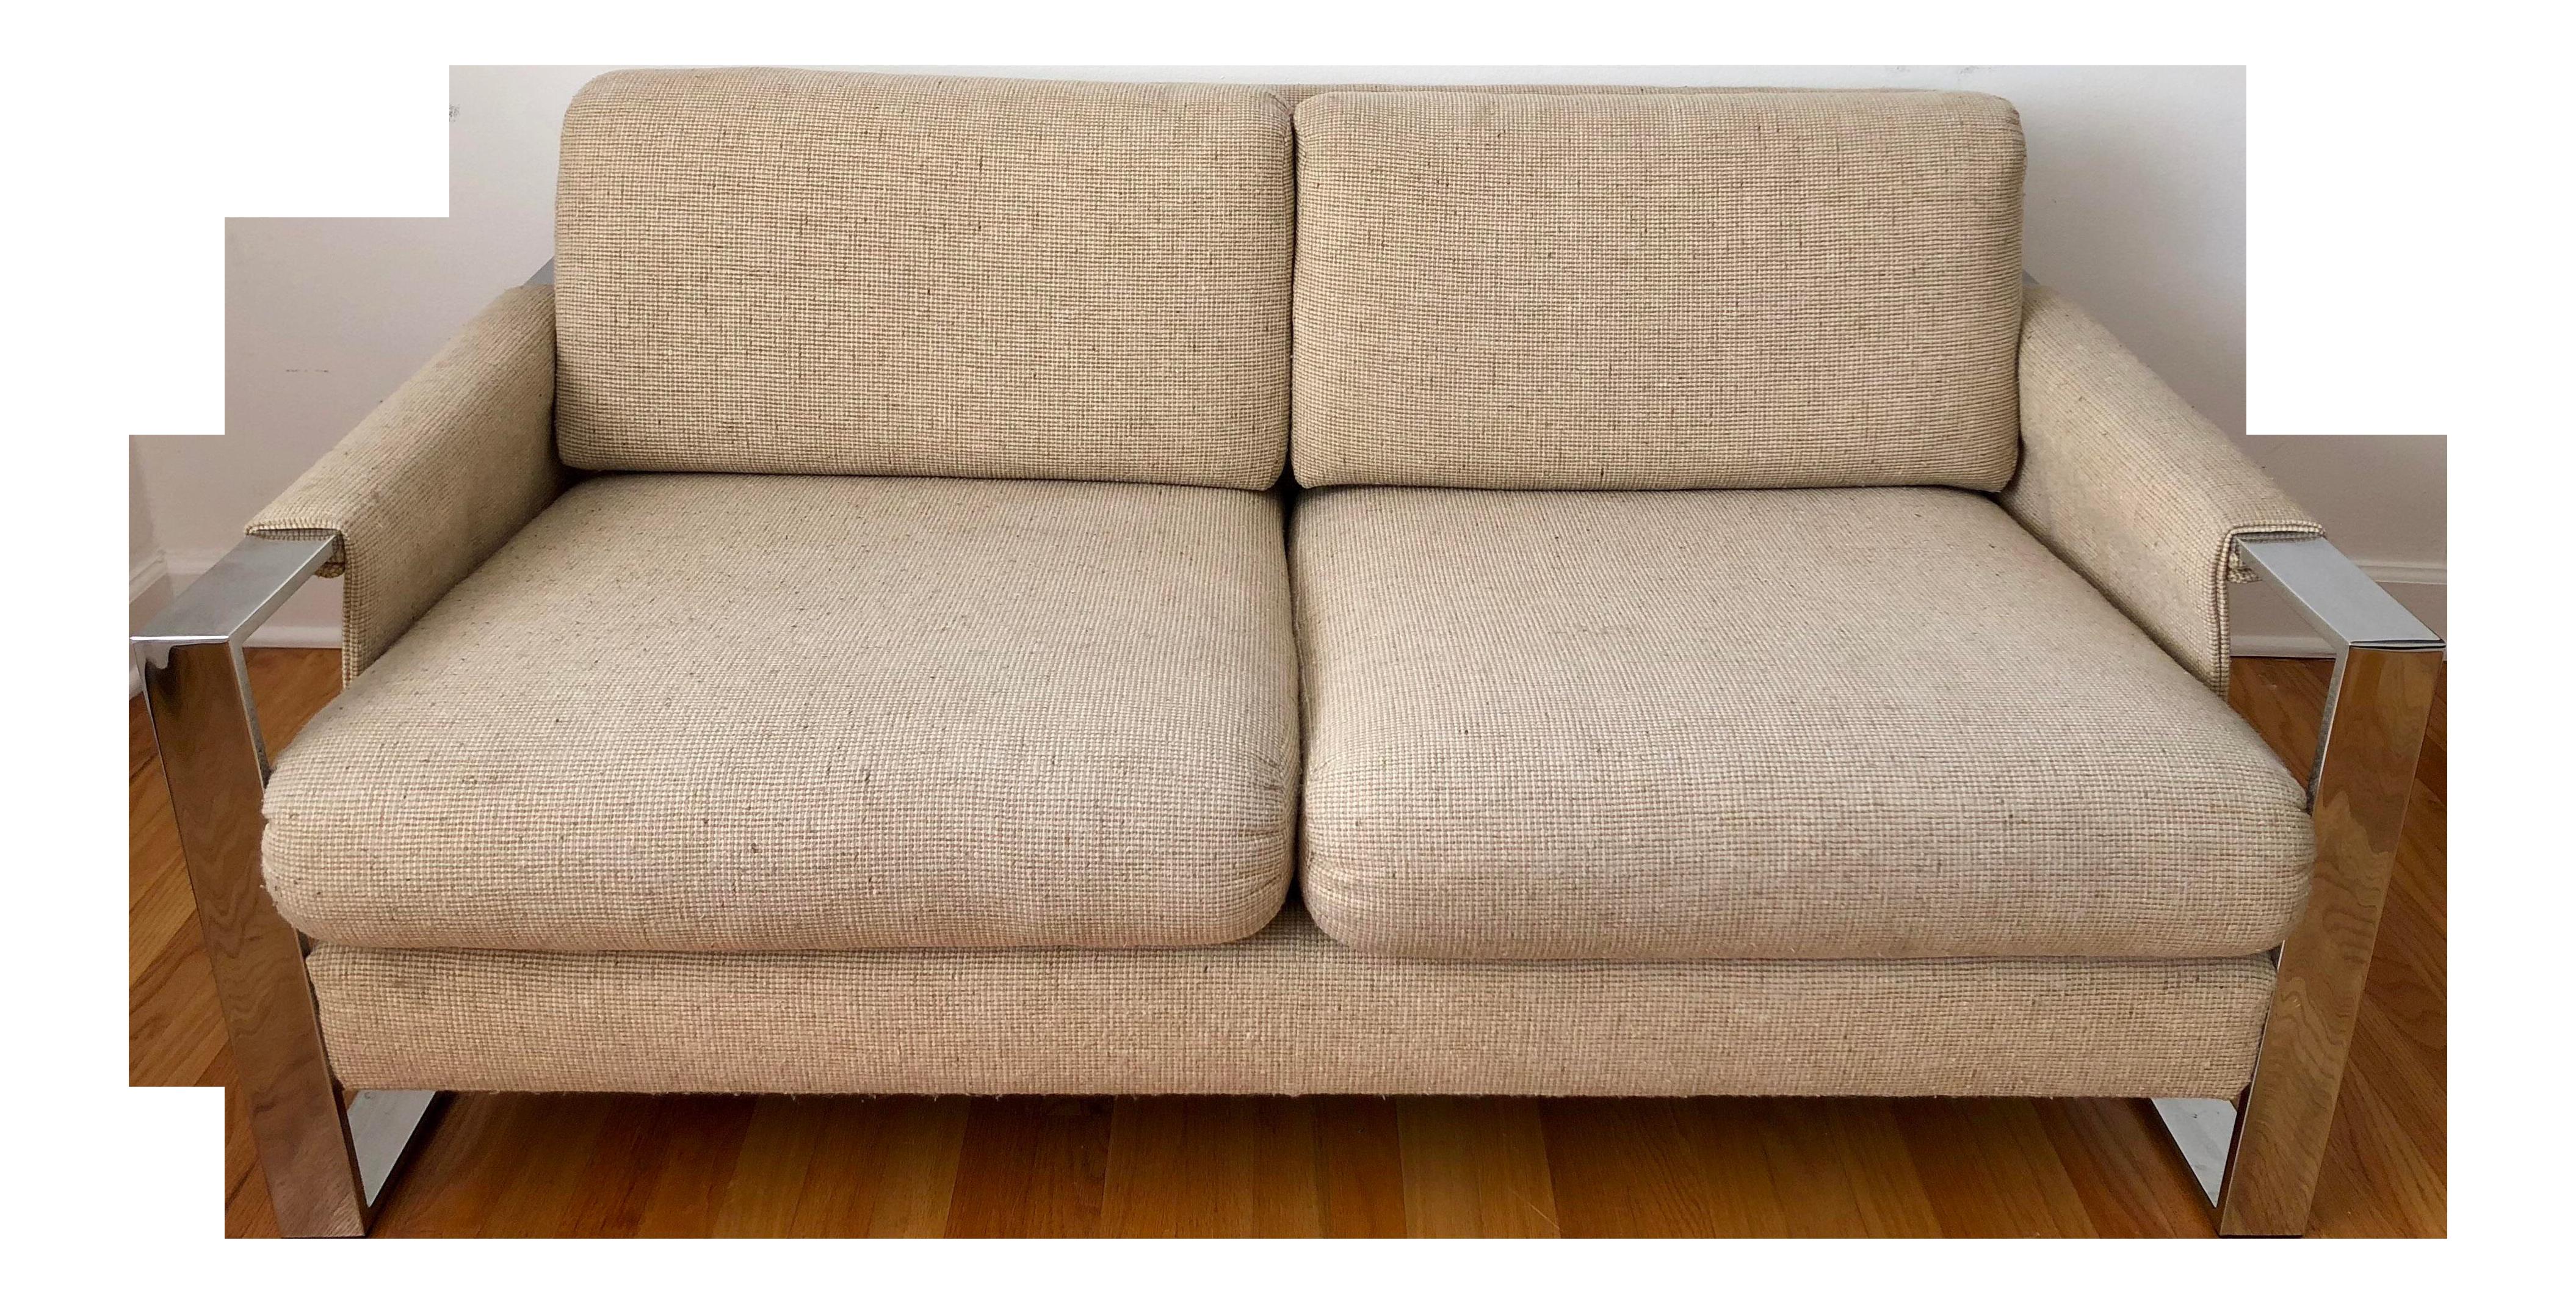 Astounding 1960S Mid Century Modern Milo Baughman Loveseat Sofa Uwap Interior Chair Design Uwaporg